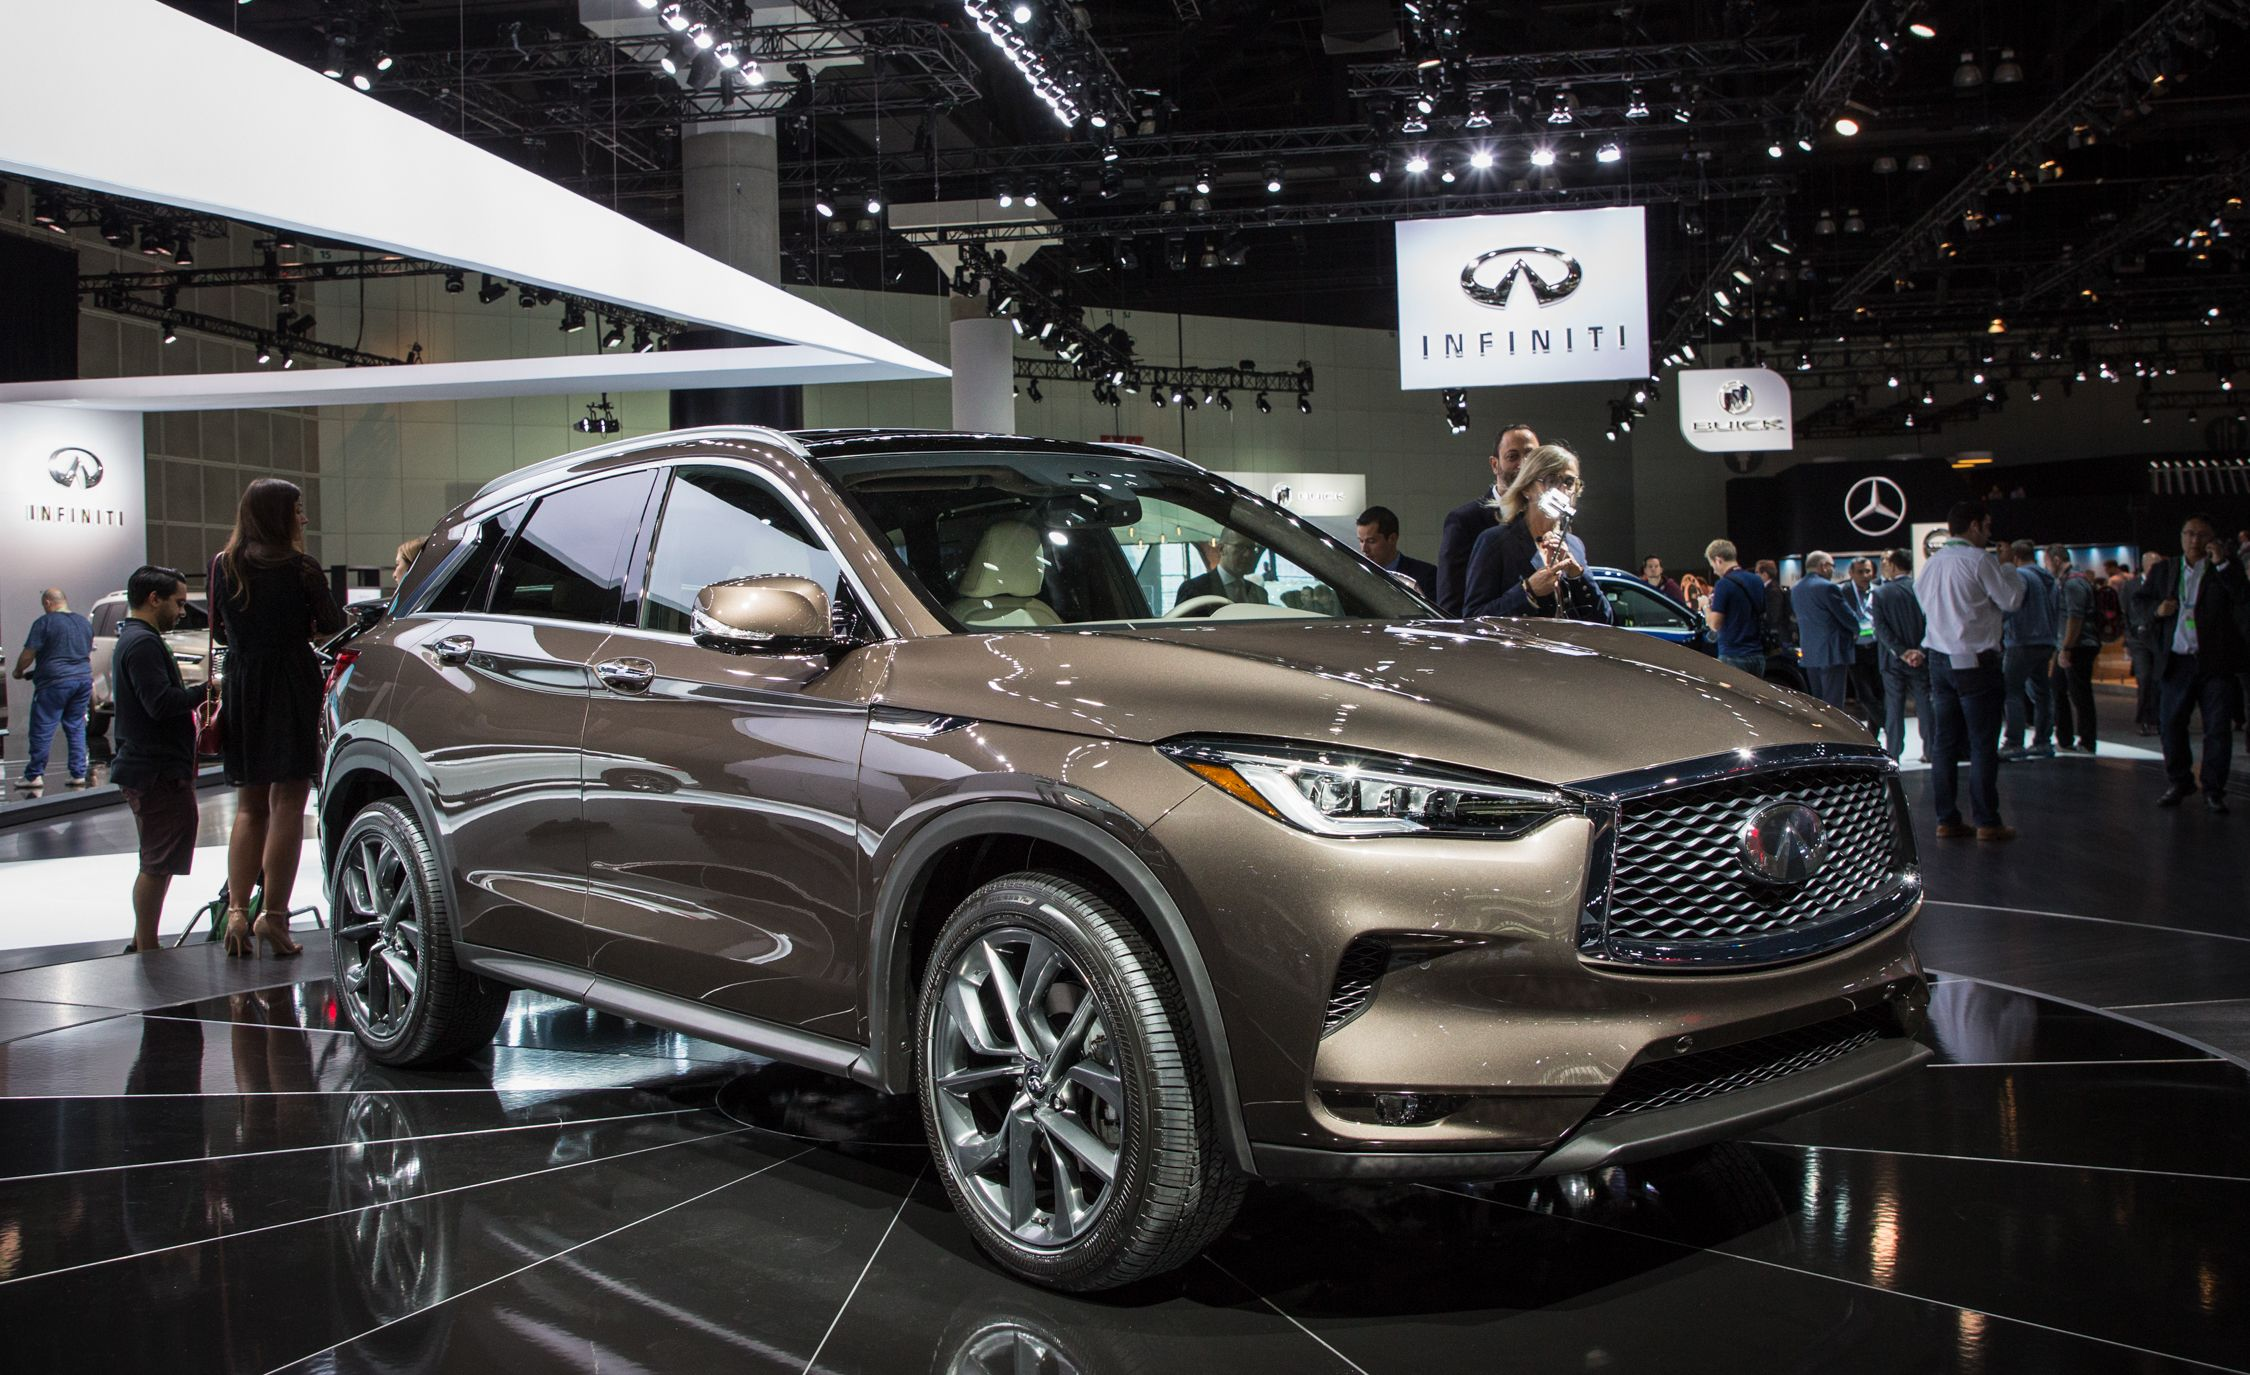 2019 infiniti qx50 all new compact luxury crossover boasts radical rh caranddriver com